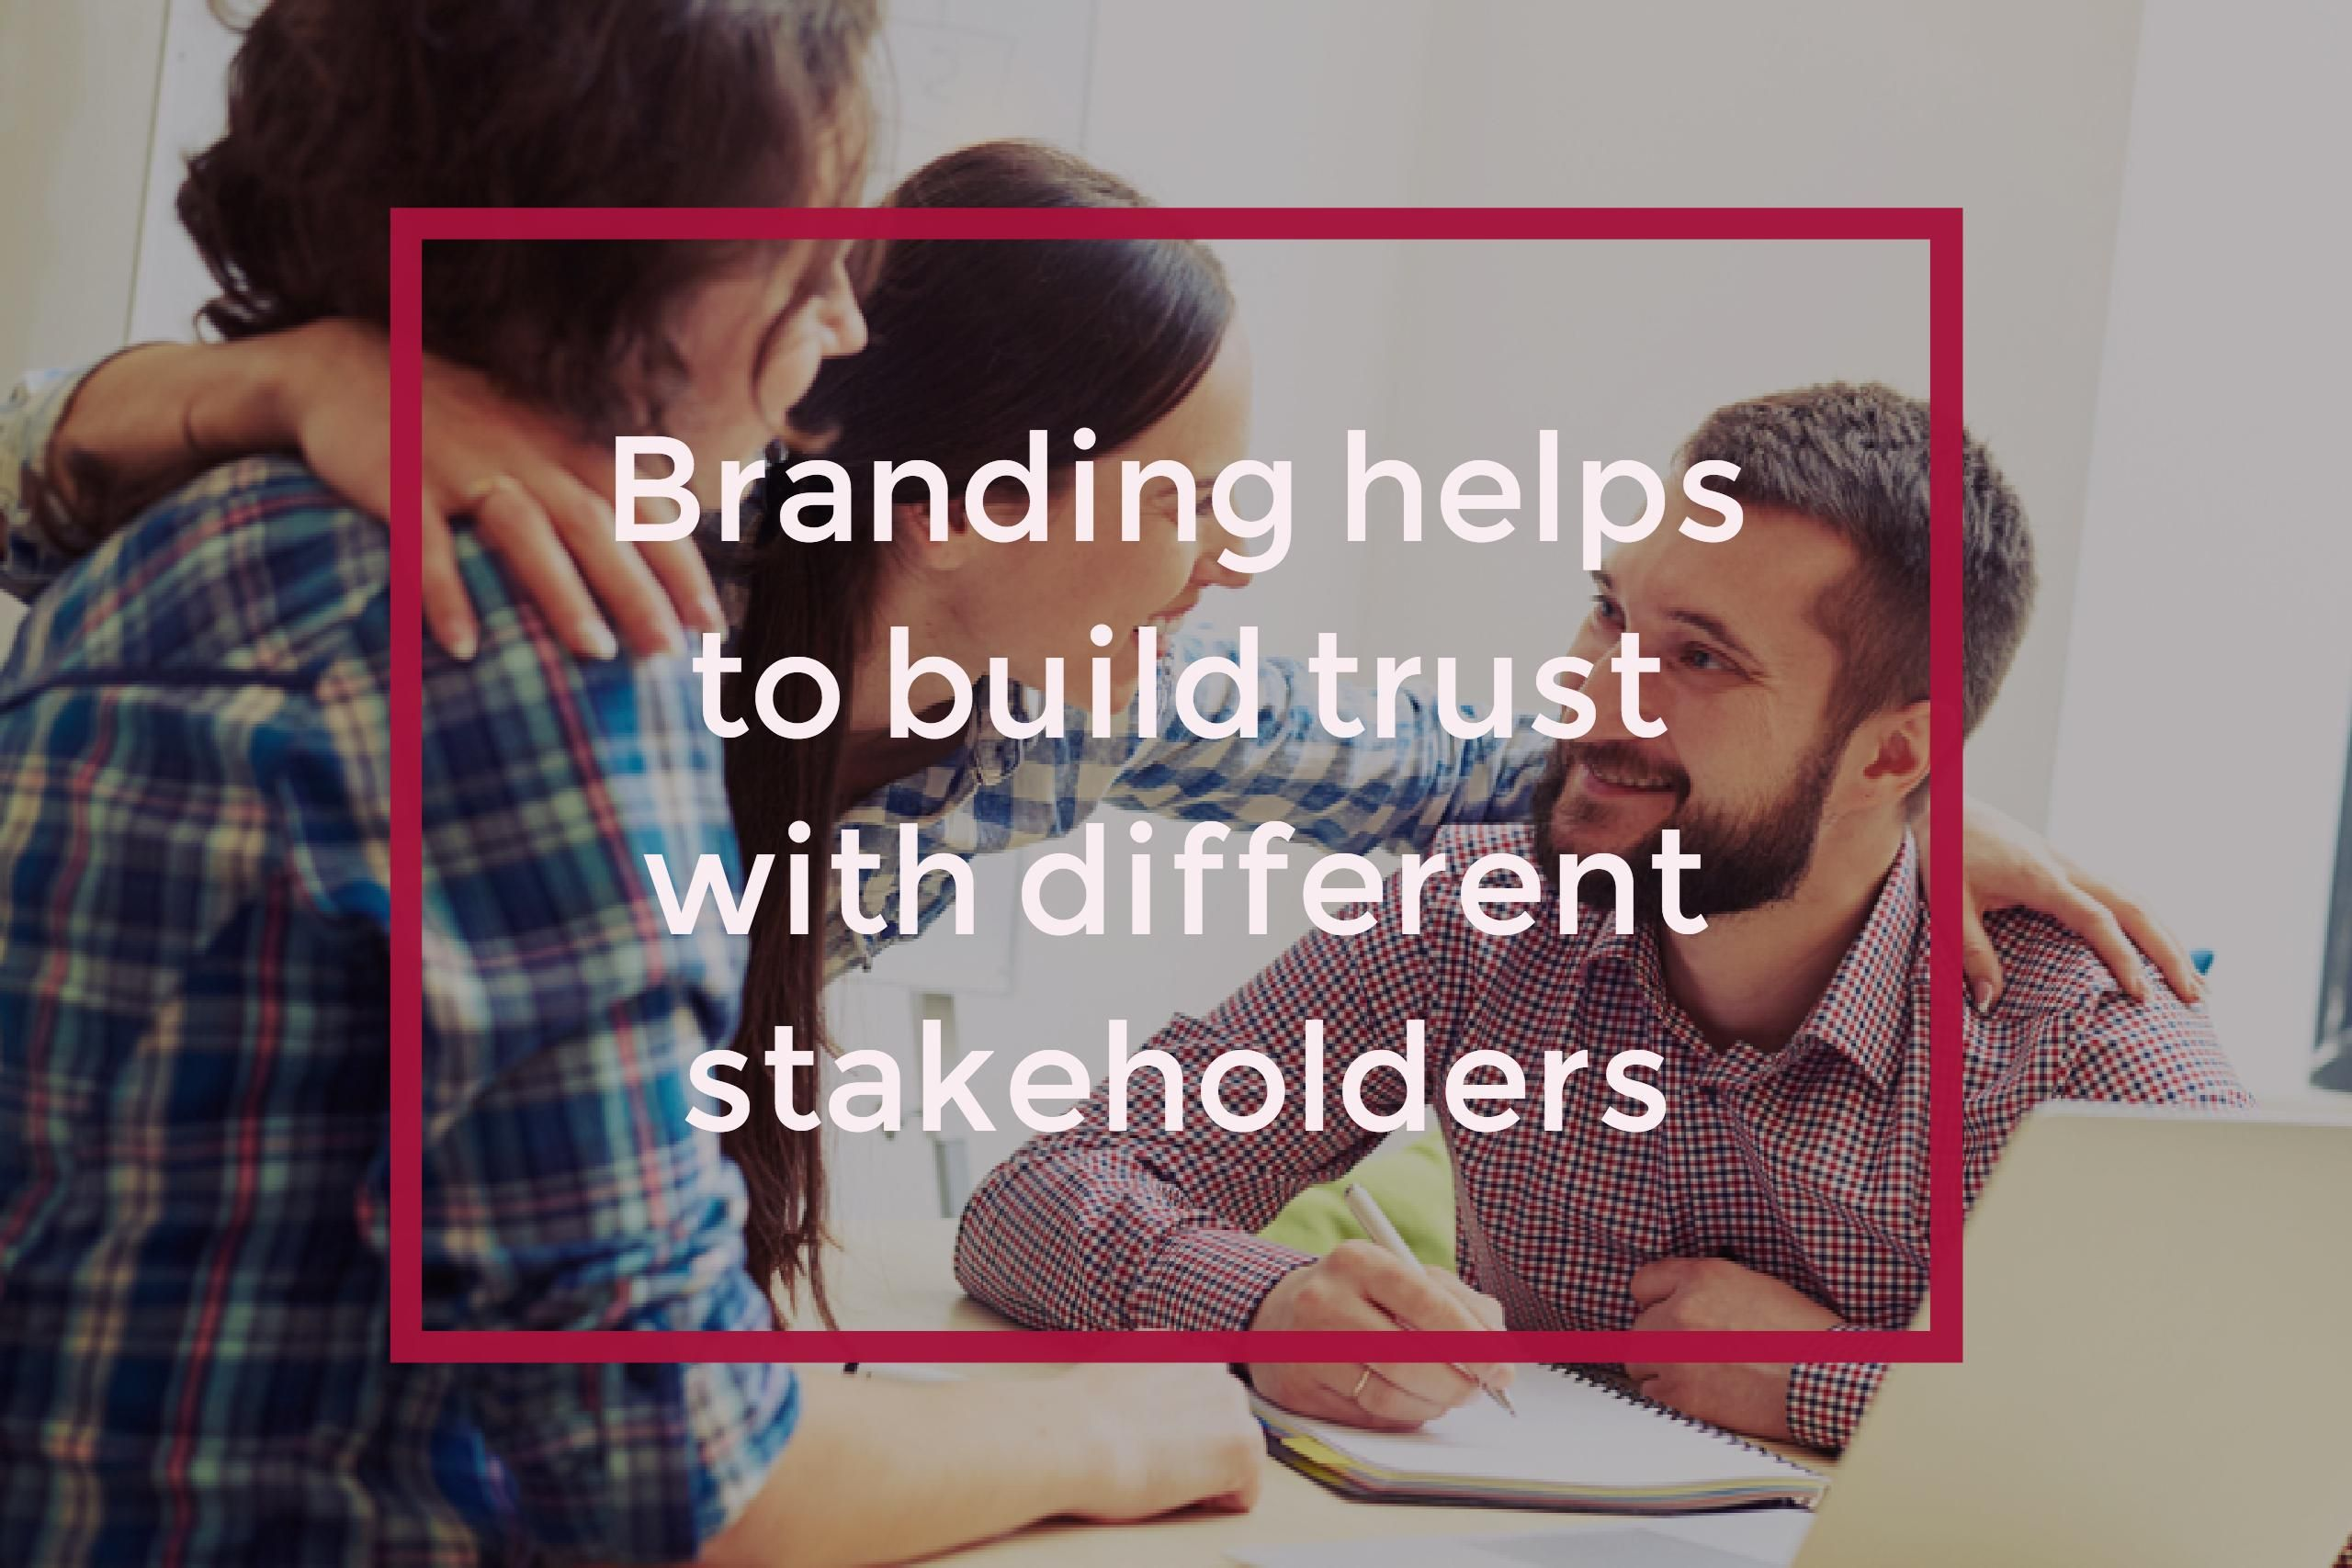 Social Media (With images) Branding help, Social media